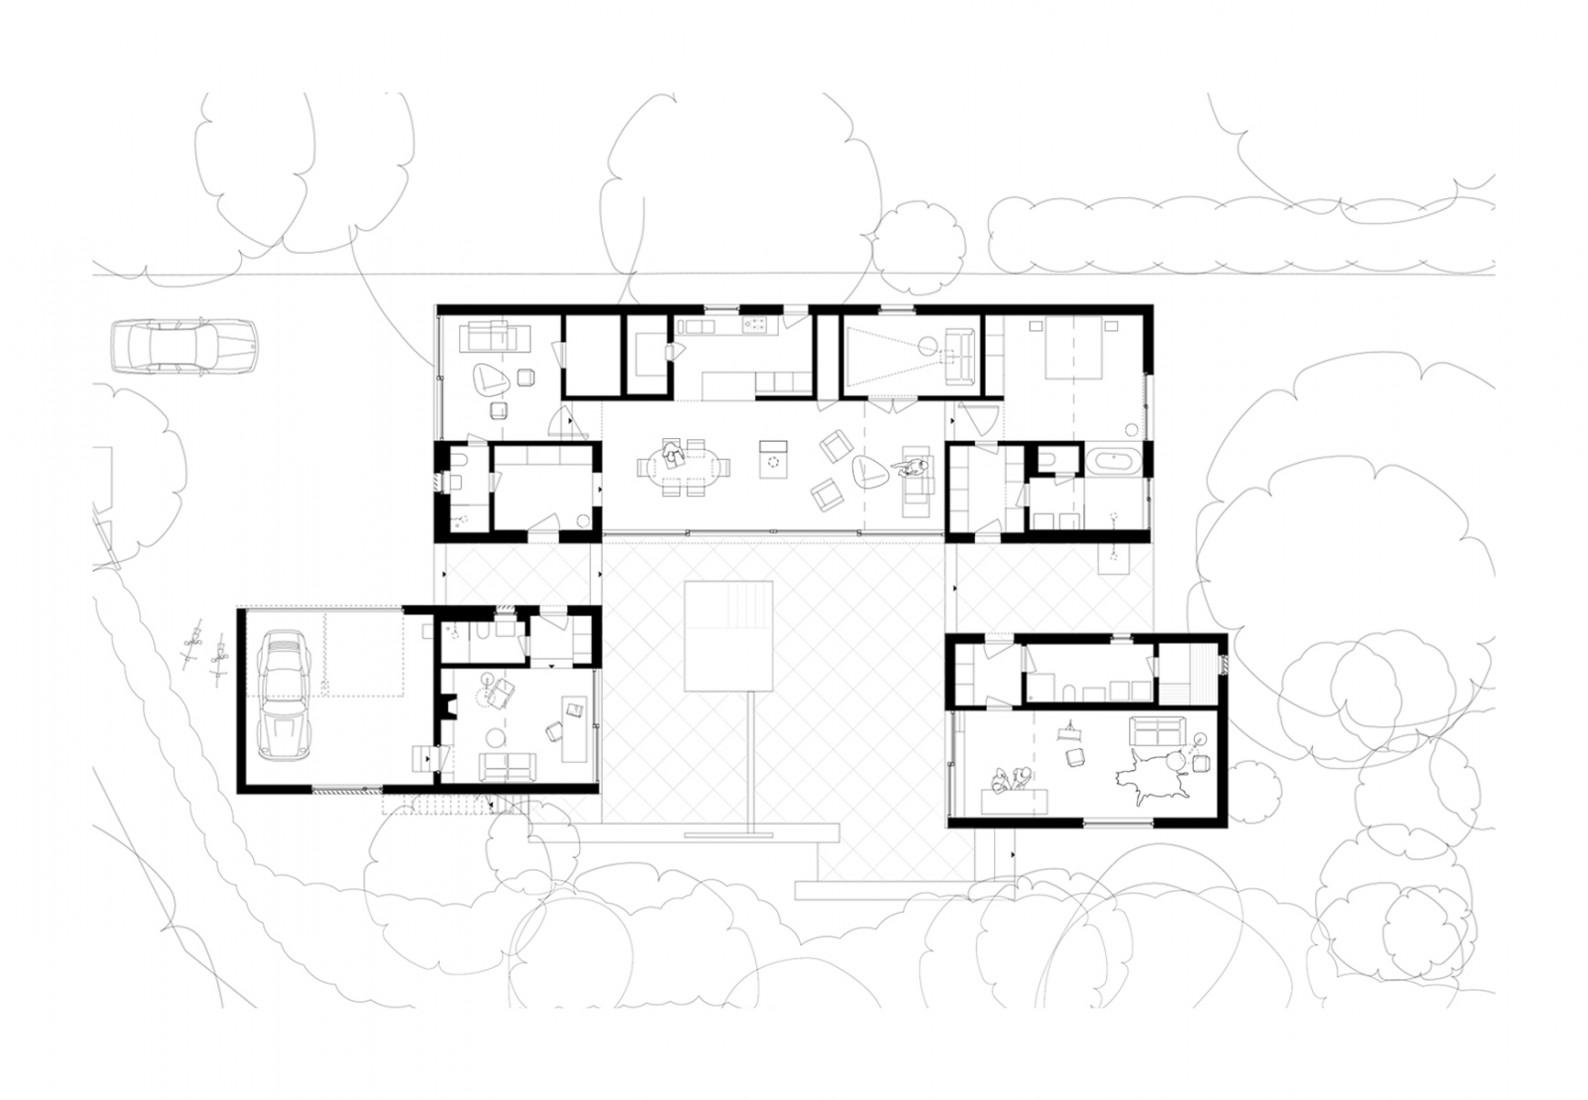 BHSF Architekten